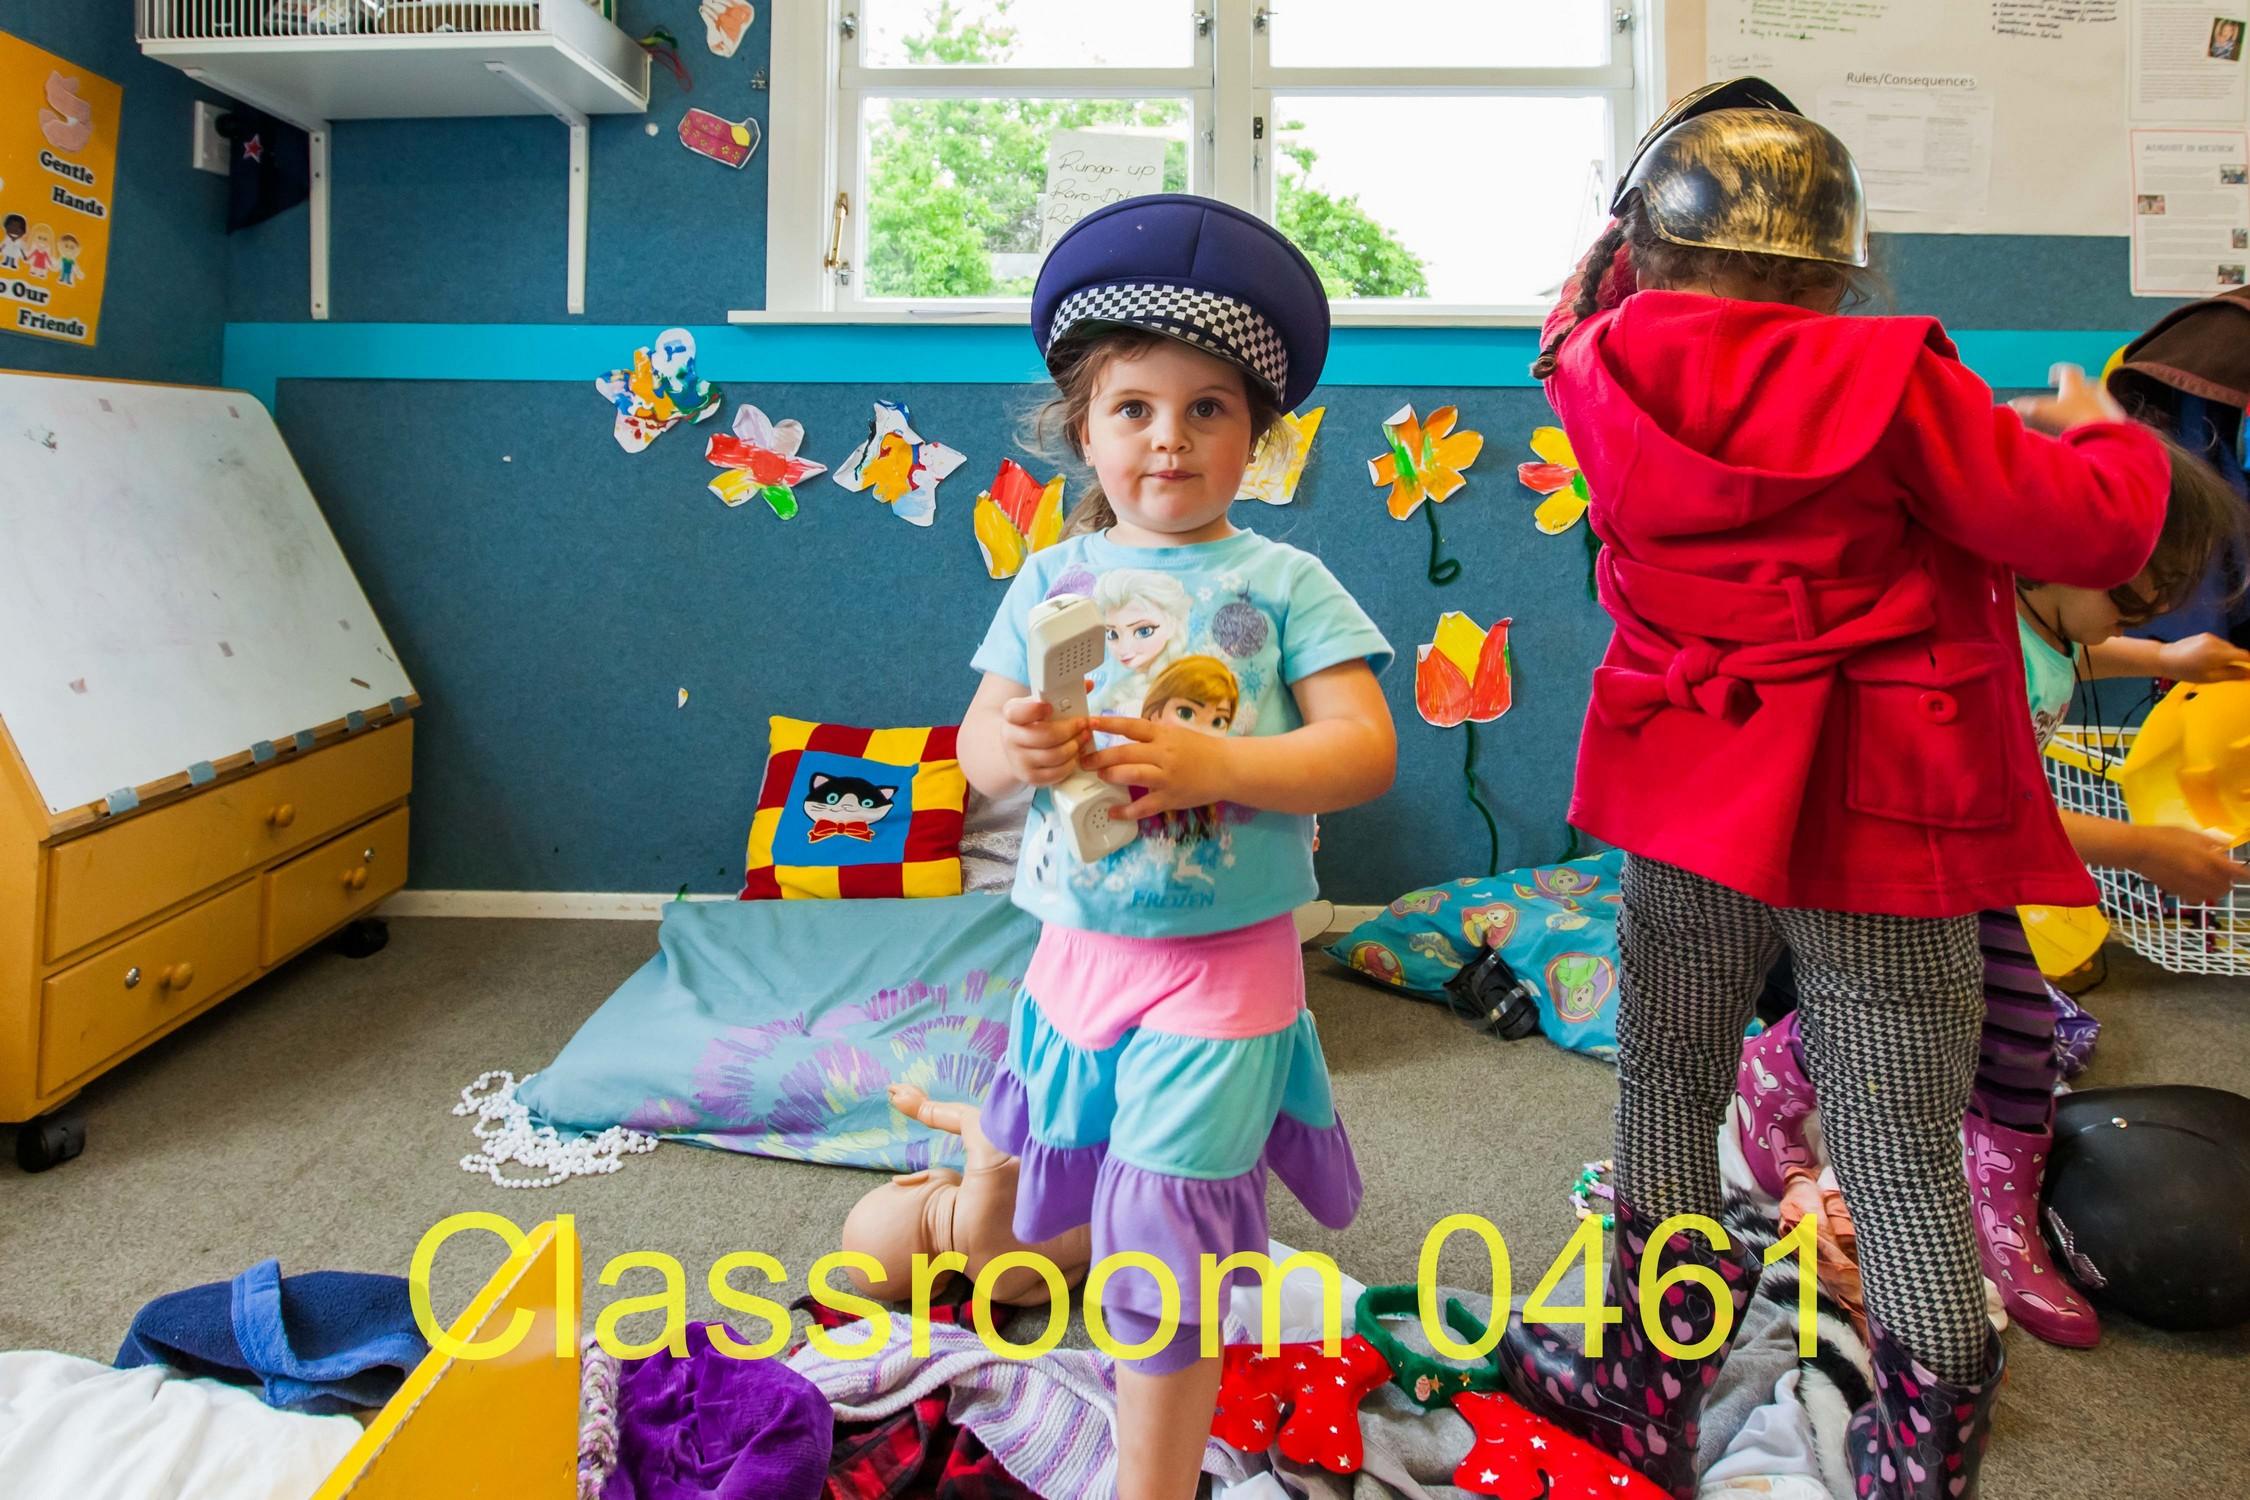 Classroom 0461